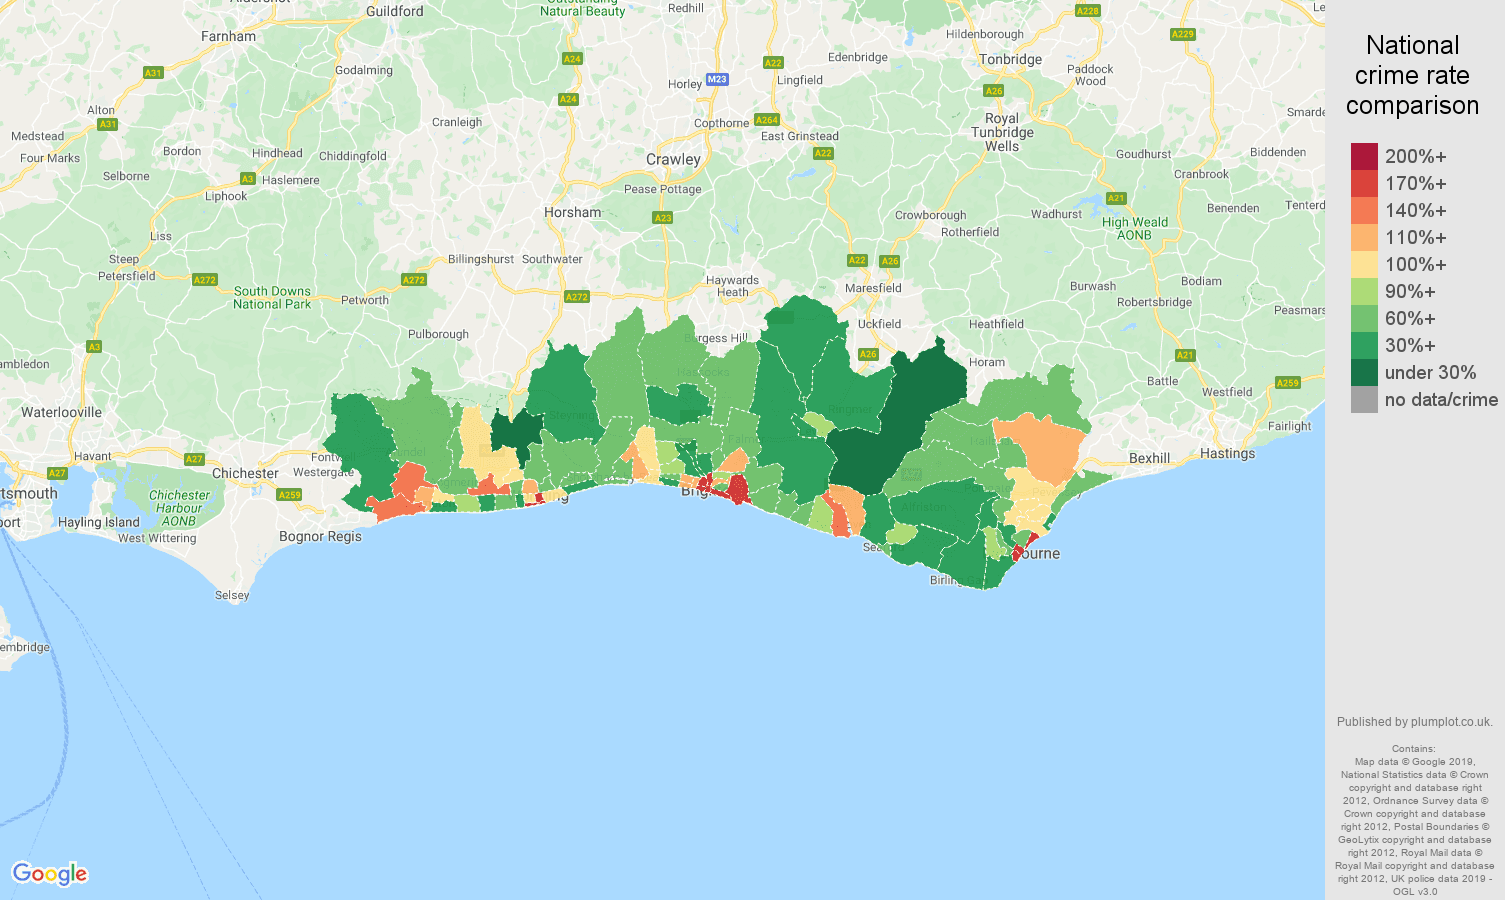 Brighton public order crime rate comparison map